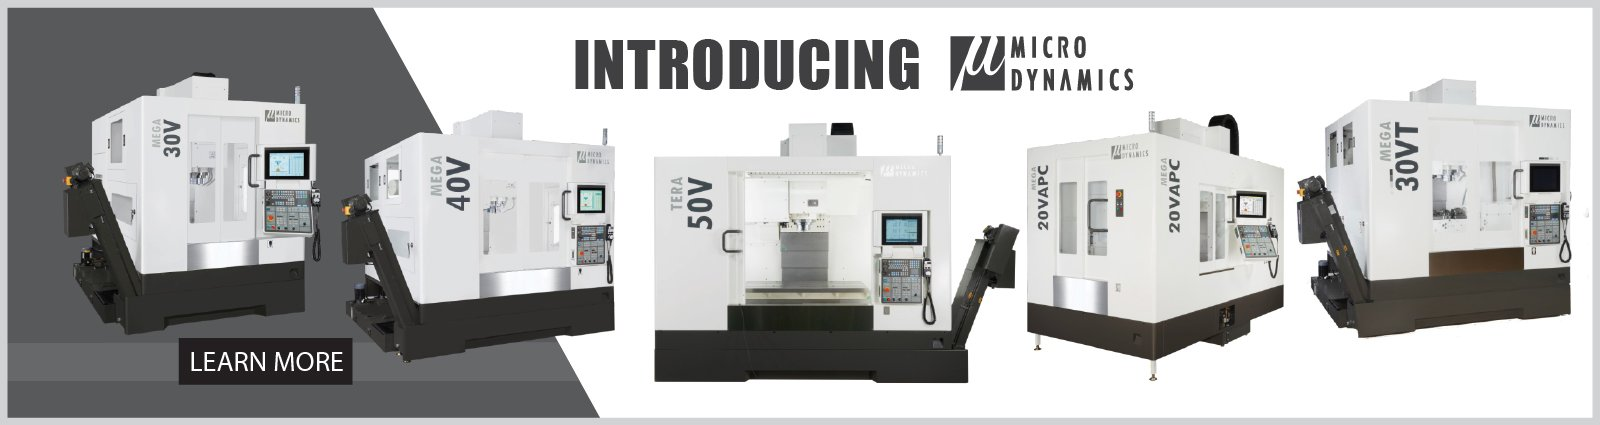 MEREDITH-MACHINERY-MICRO-DYNAMICS-CNC-MACHINE-TOOLS